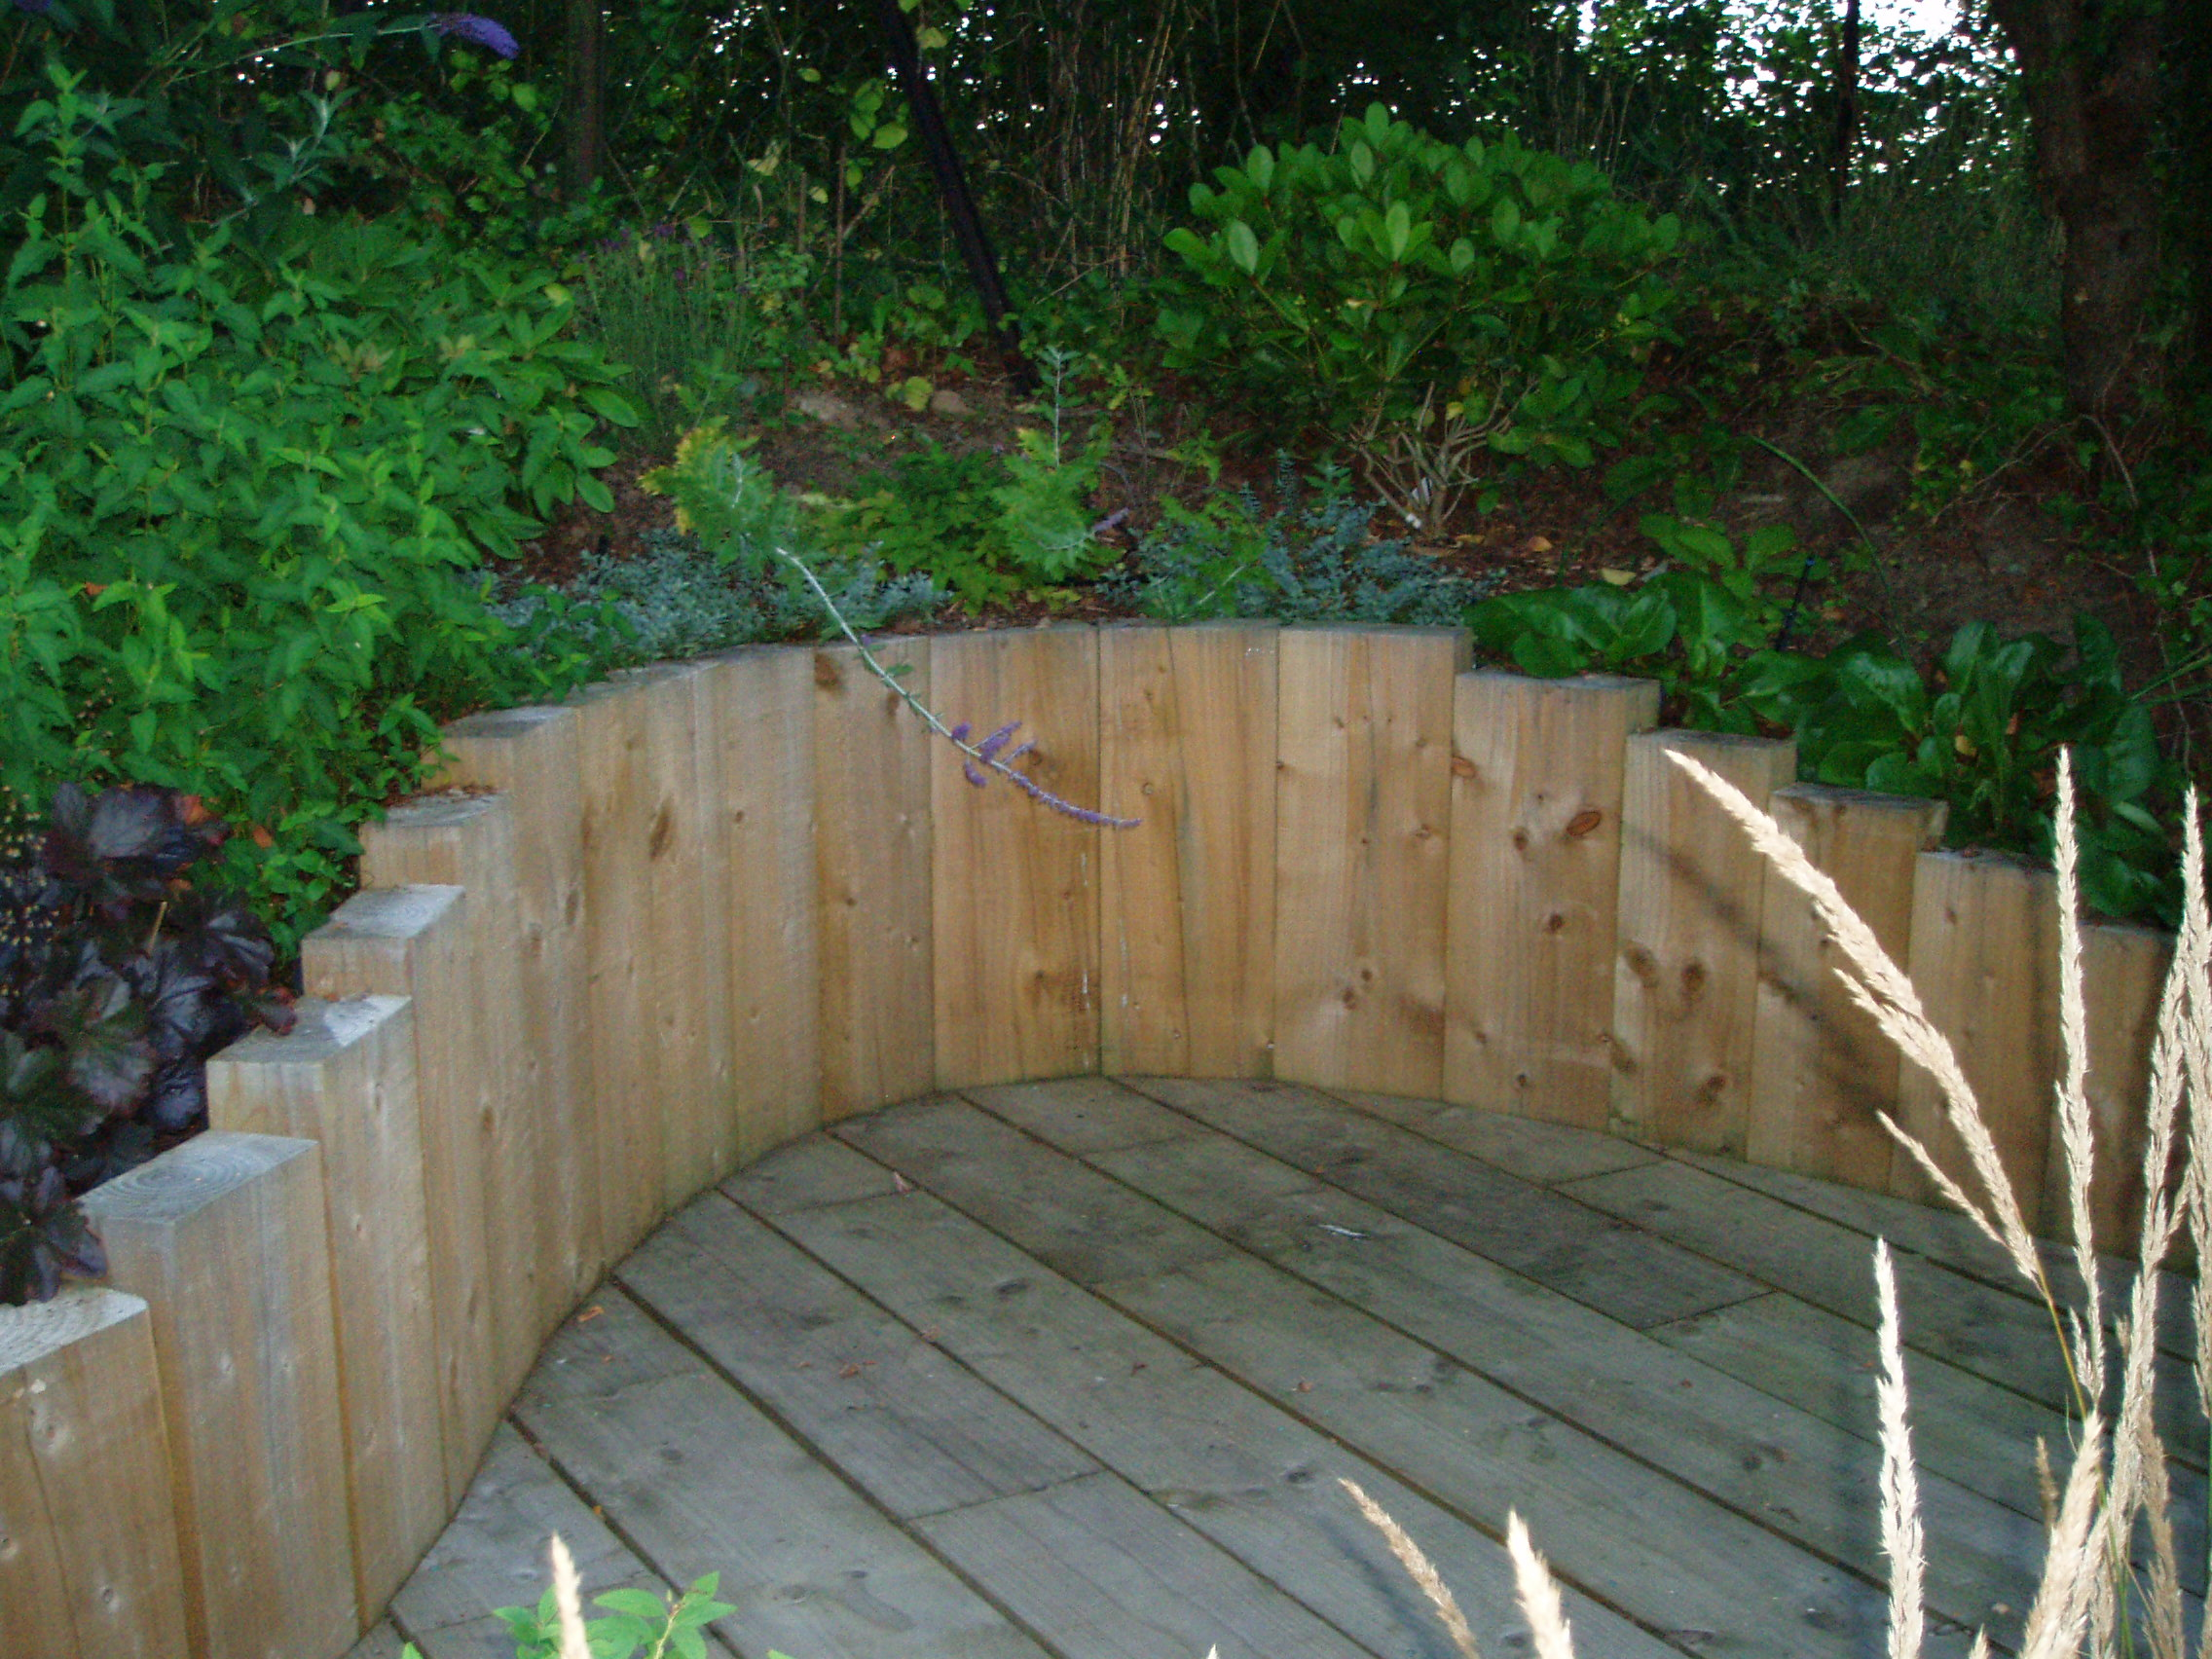 Adl Timber Structures Decking Garden Landscaping Sevenoaks